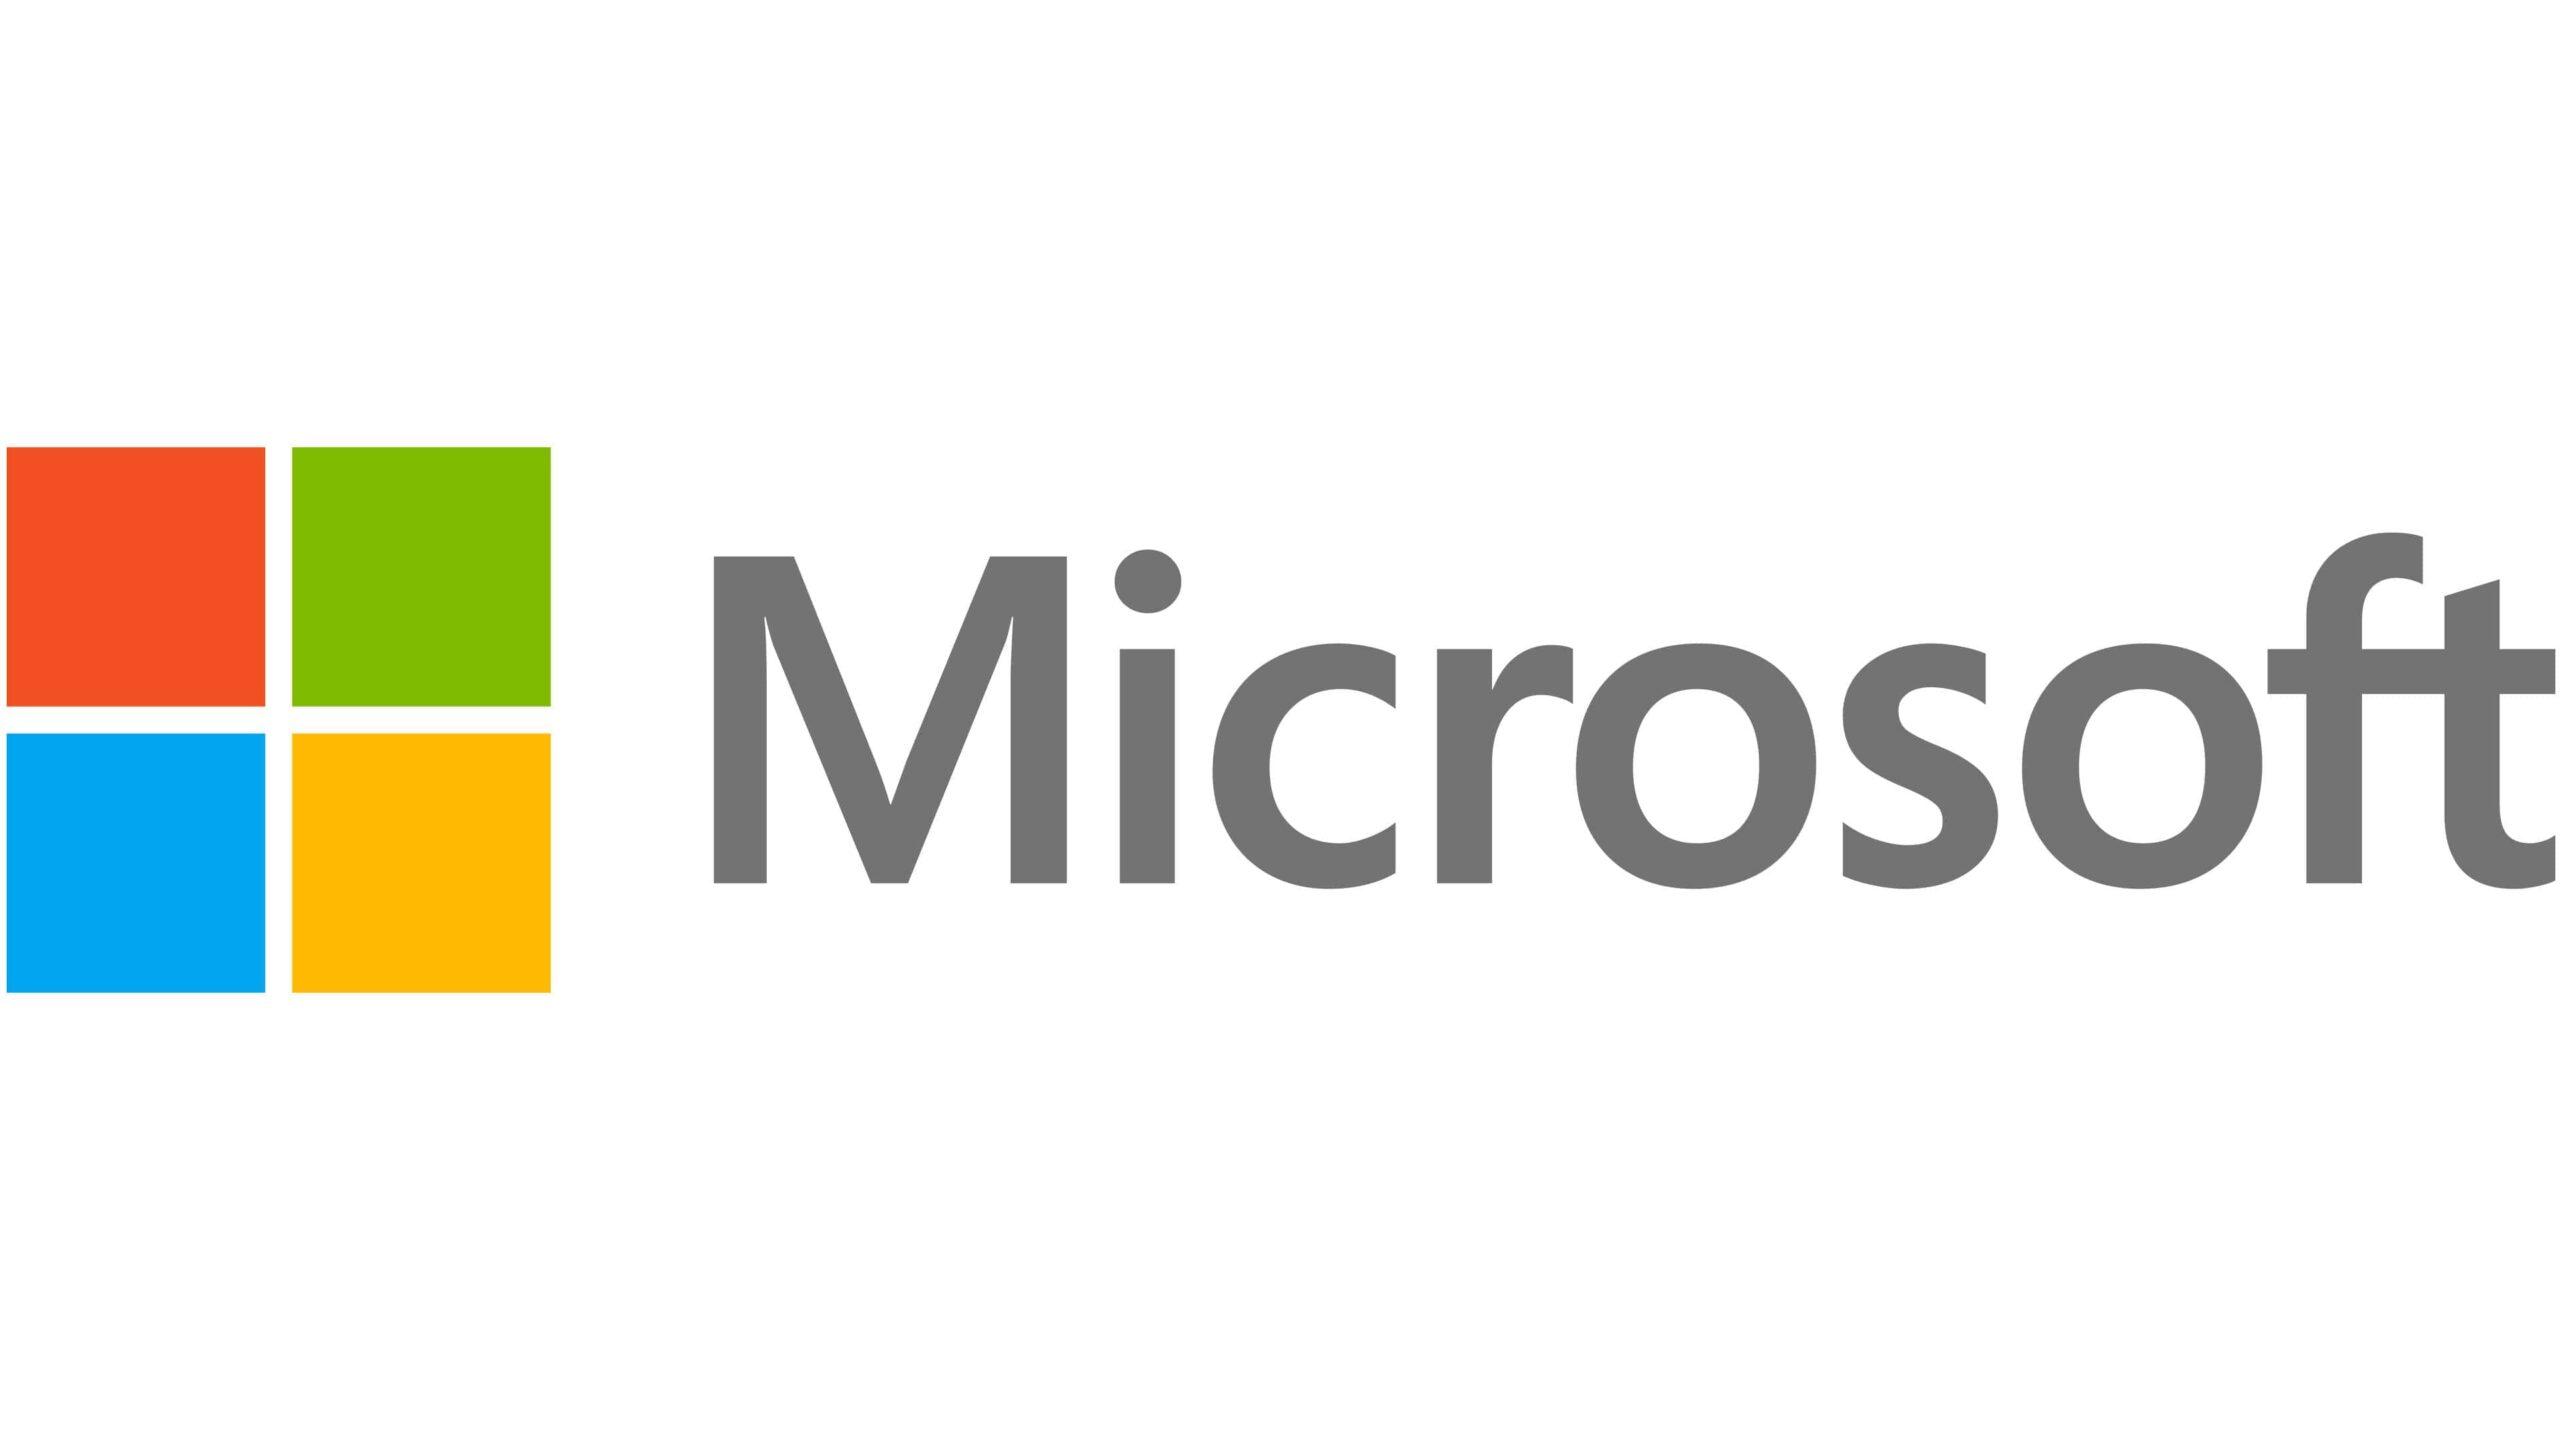 Microsoft-Logo-2012-present